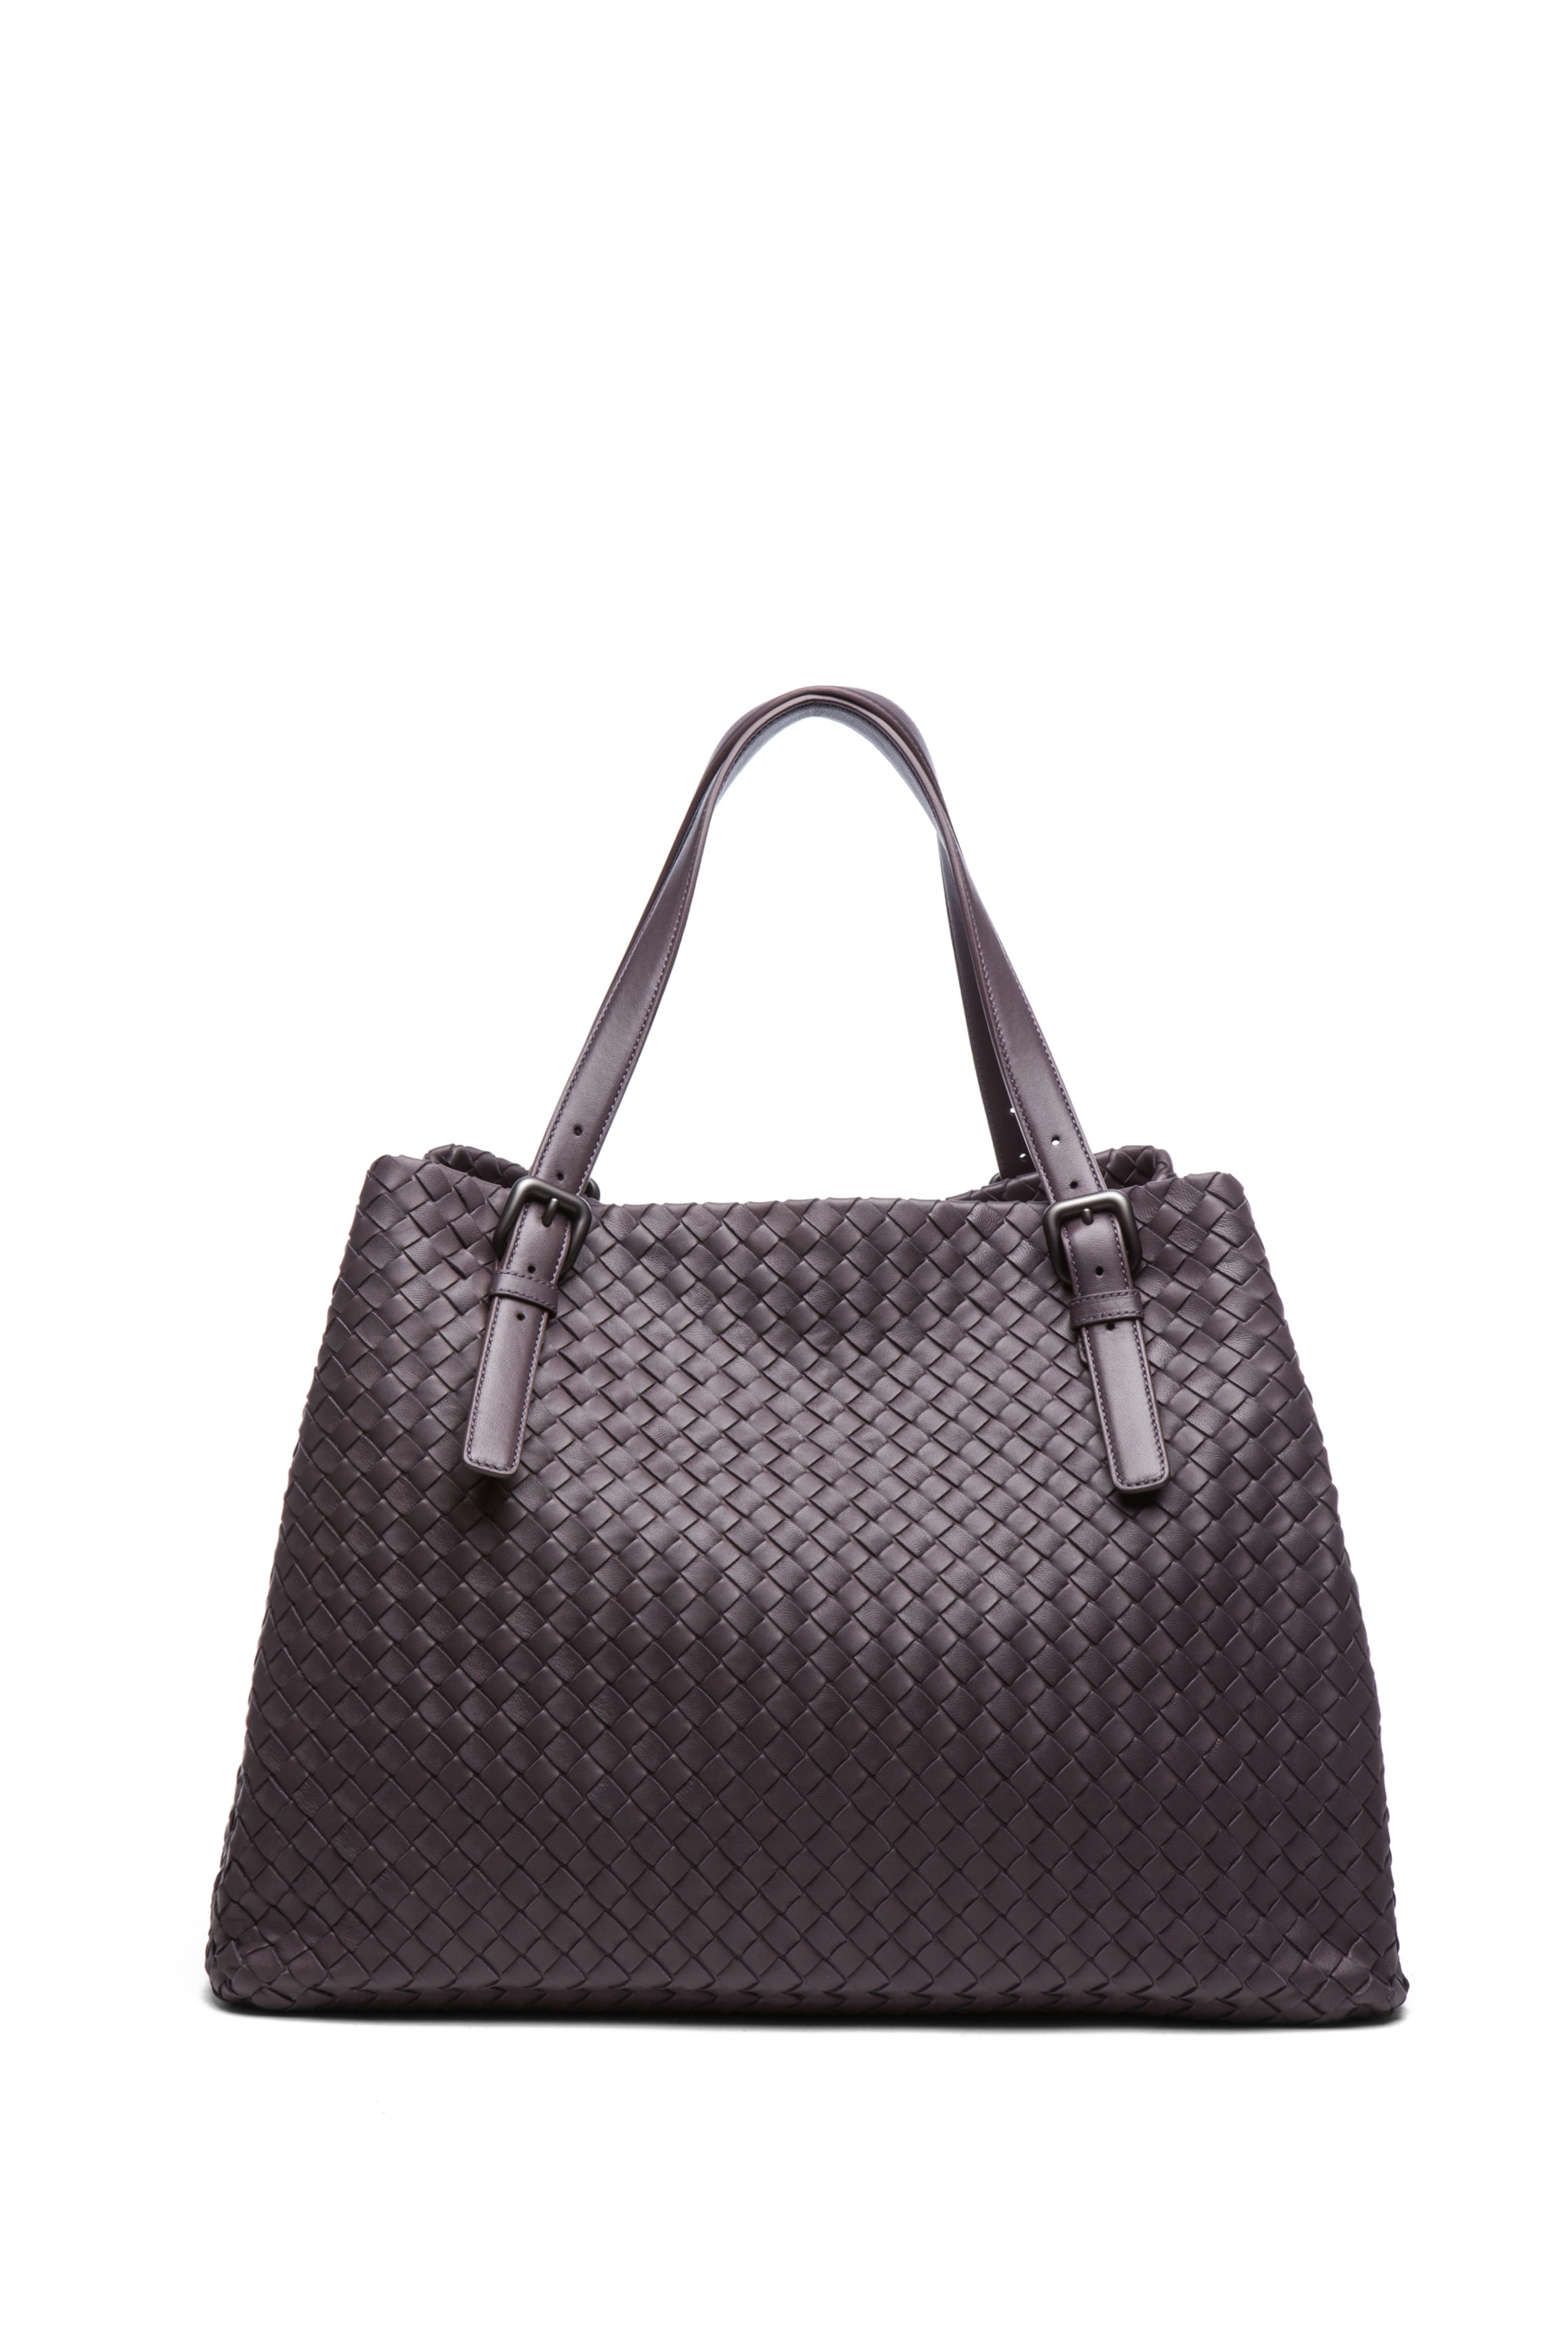 Image 2 of Bottega Veneta Large Tote Bag in Purple